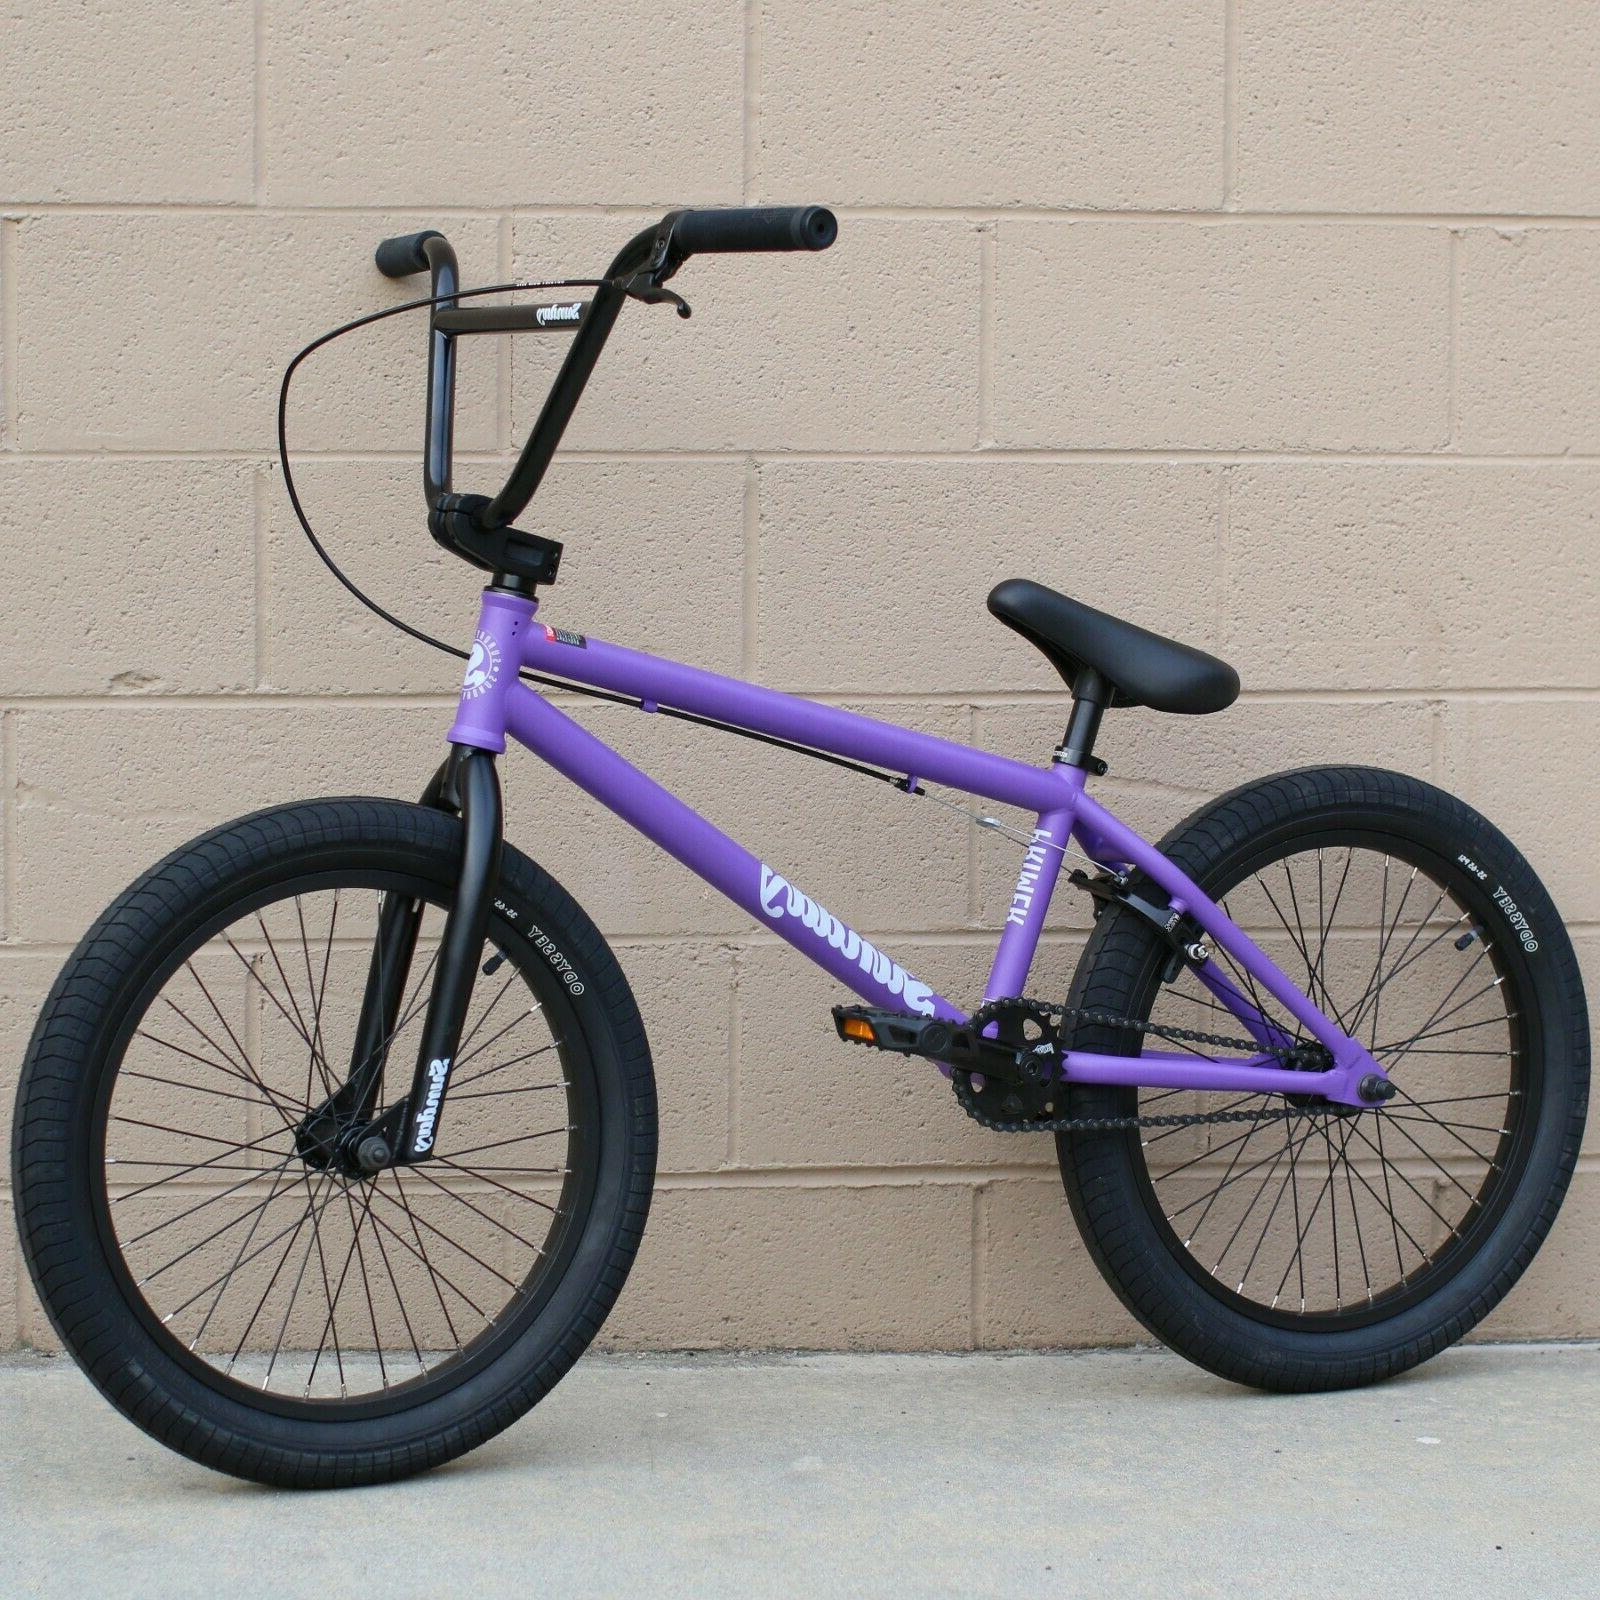 2019 bike bmx primer 20 bicycle matte